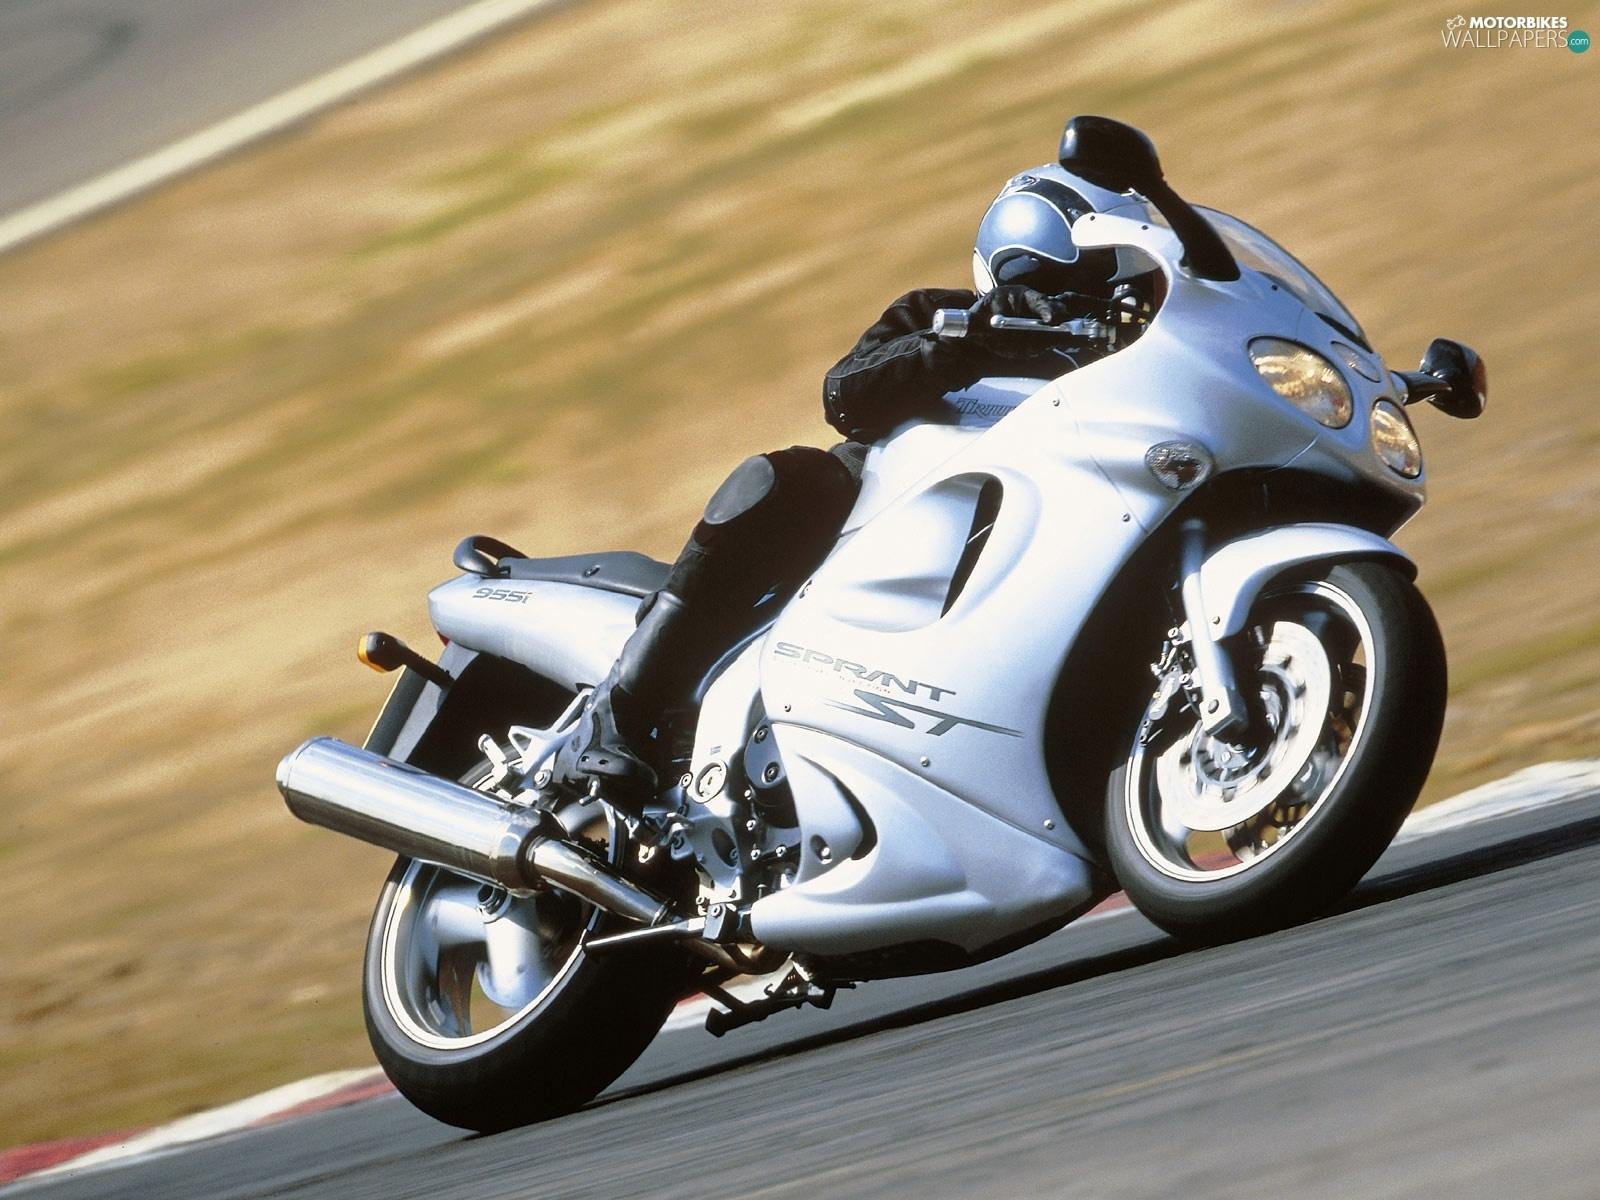 Motorbikes Wallpapers: 1600x1200